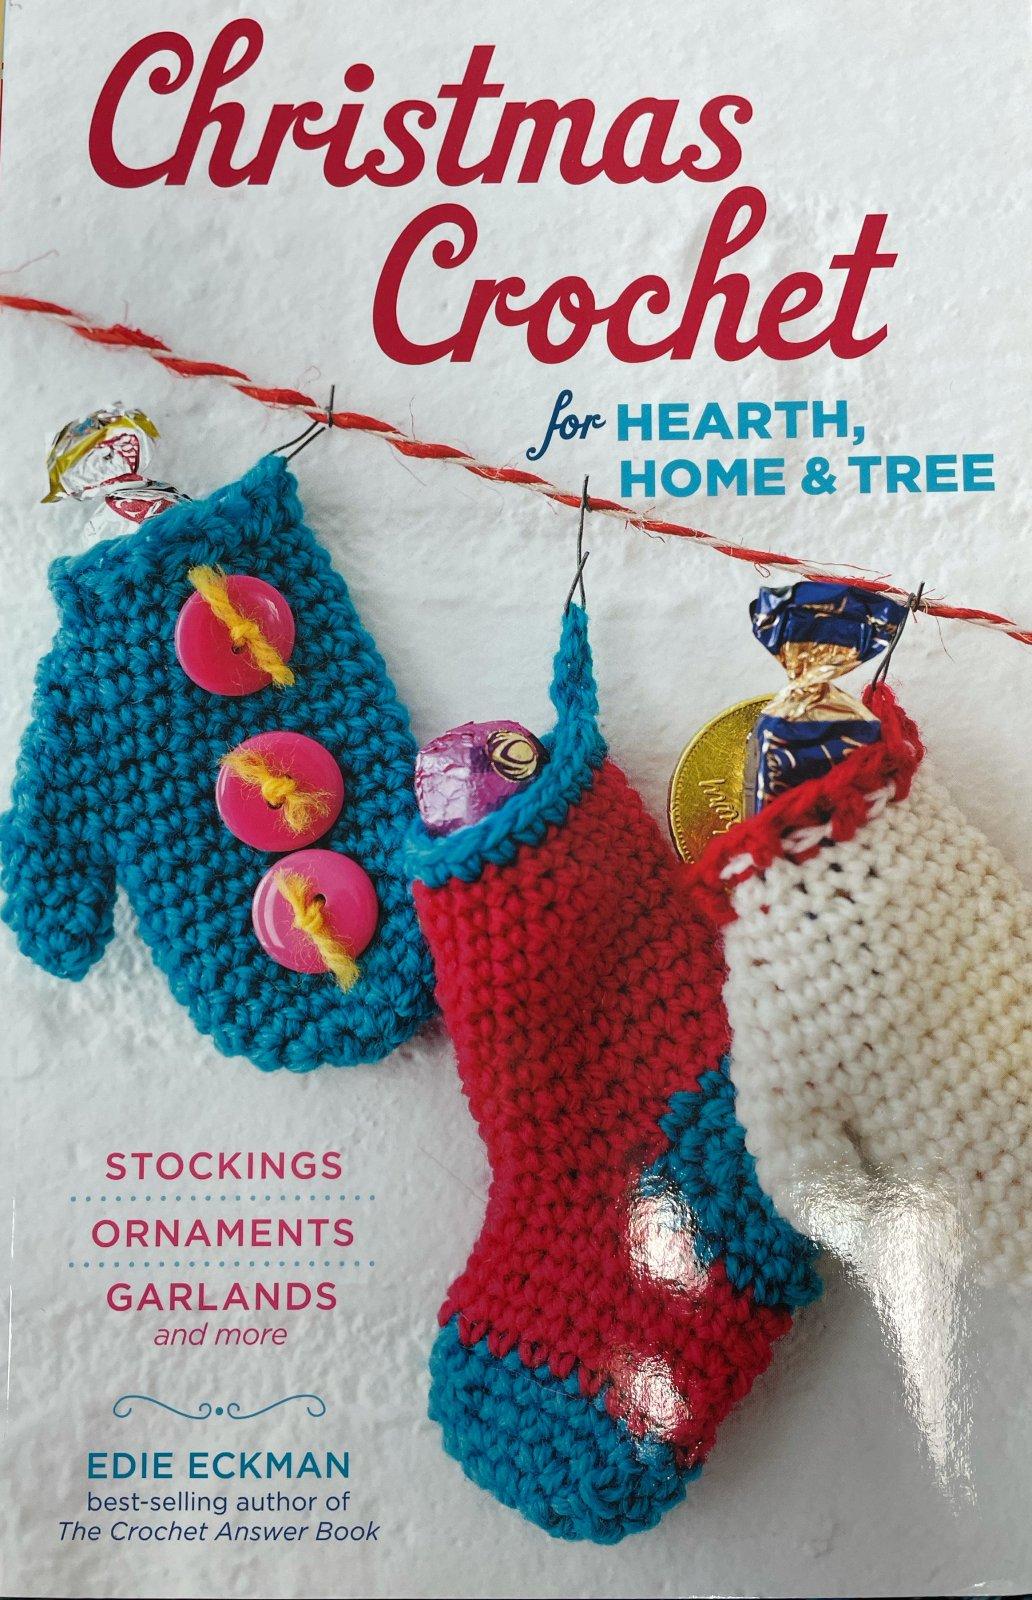 Books: Christmas Crochet for Hearth, Home & Tree